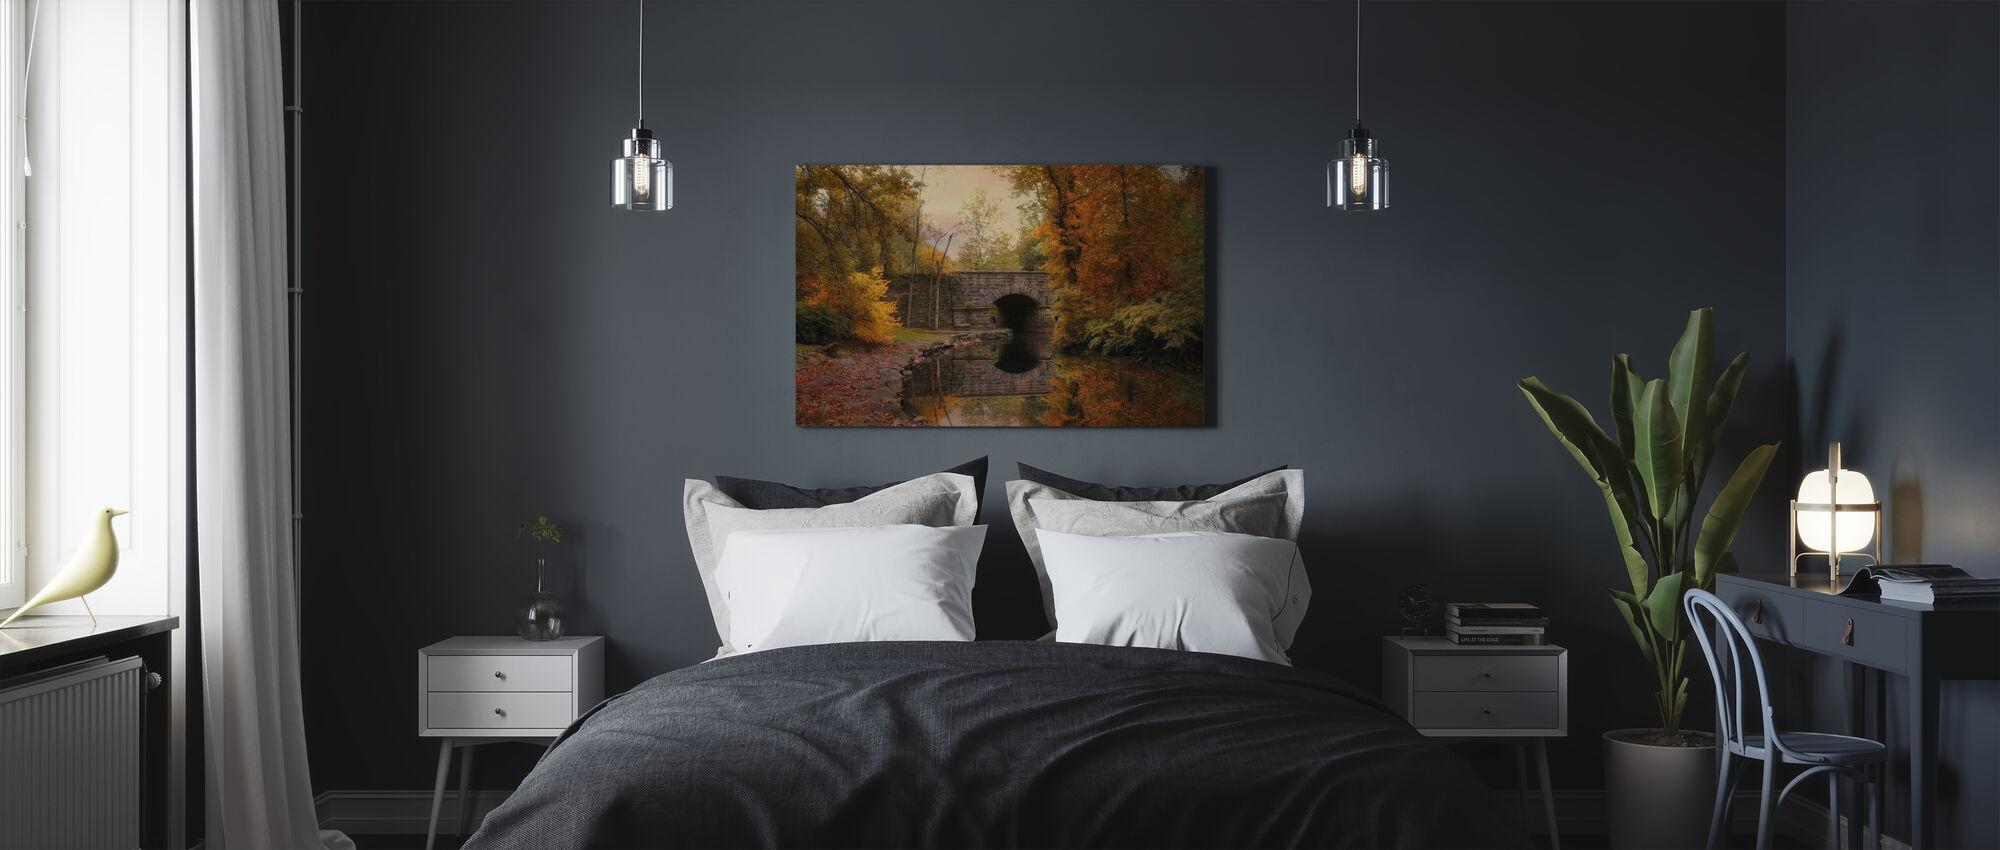 Midland Bridge - Canvas print - Bedroom